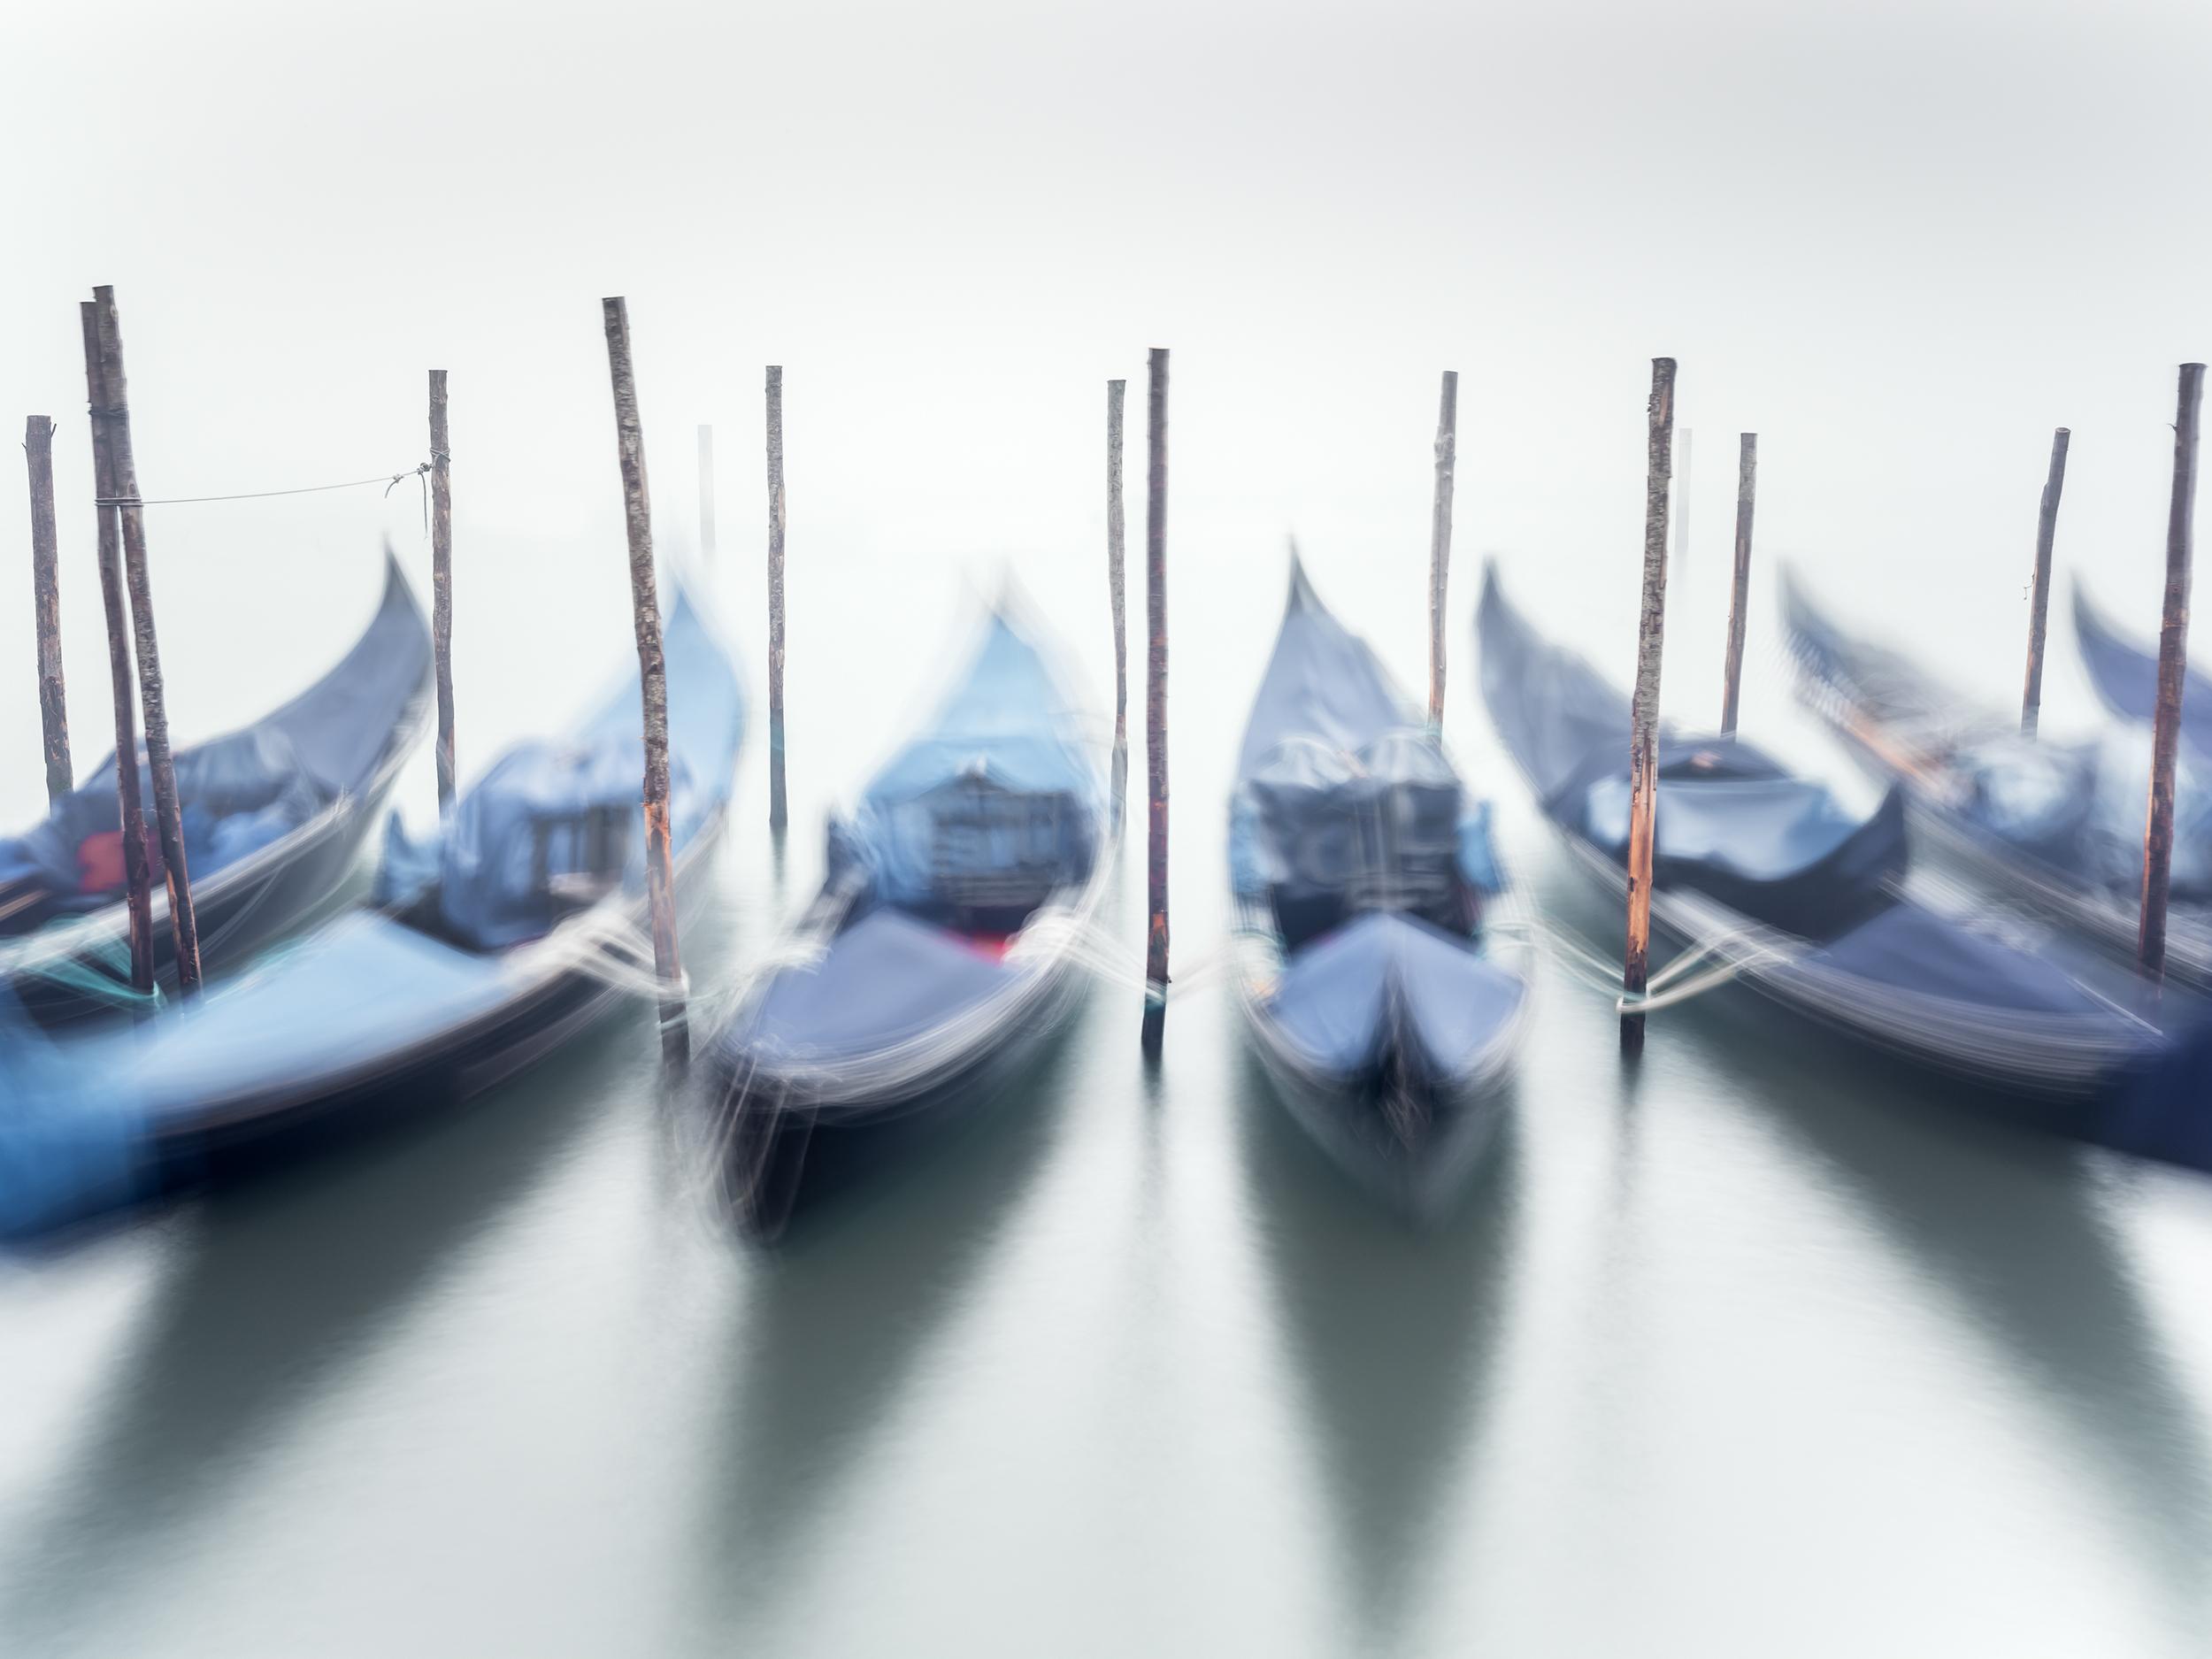 Gondola Study 2 - Venice (2188)